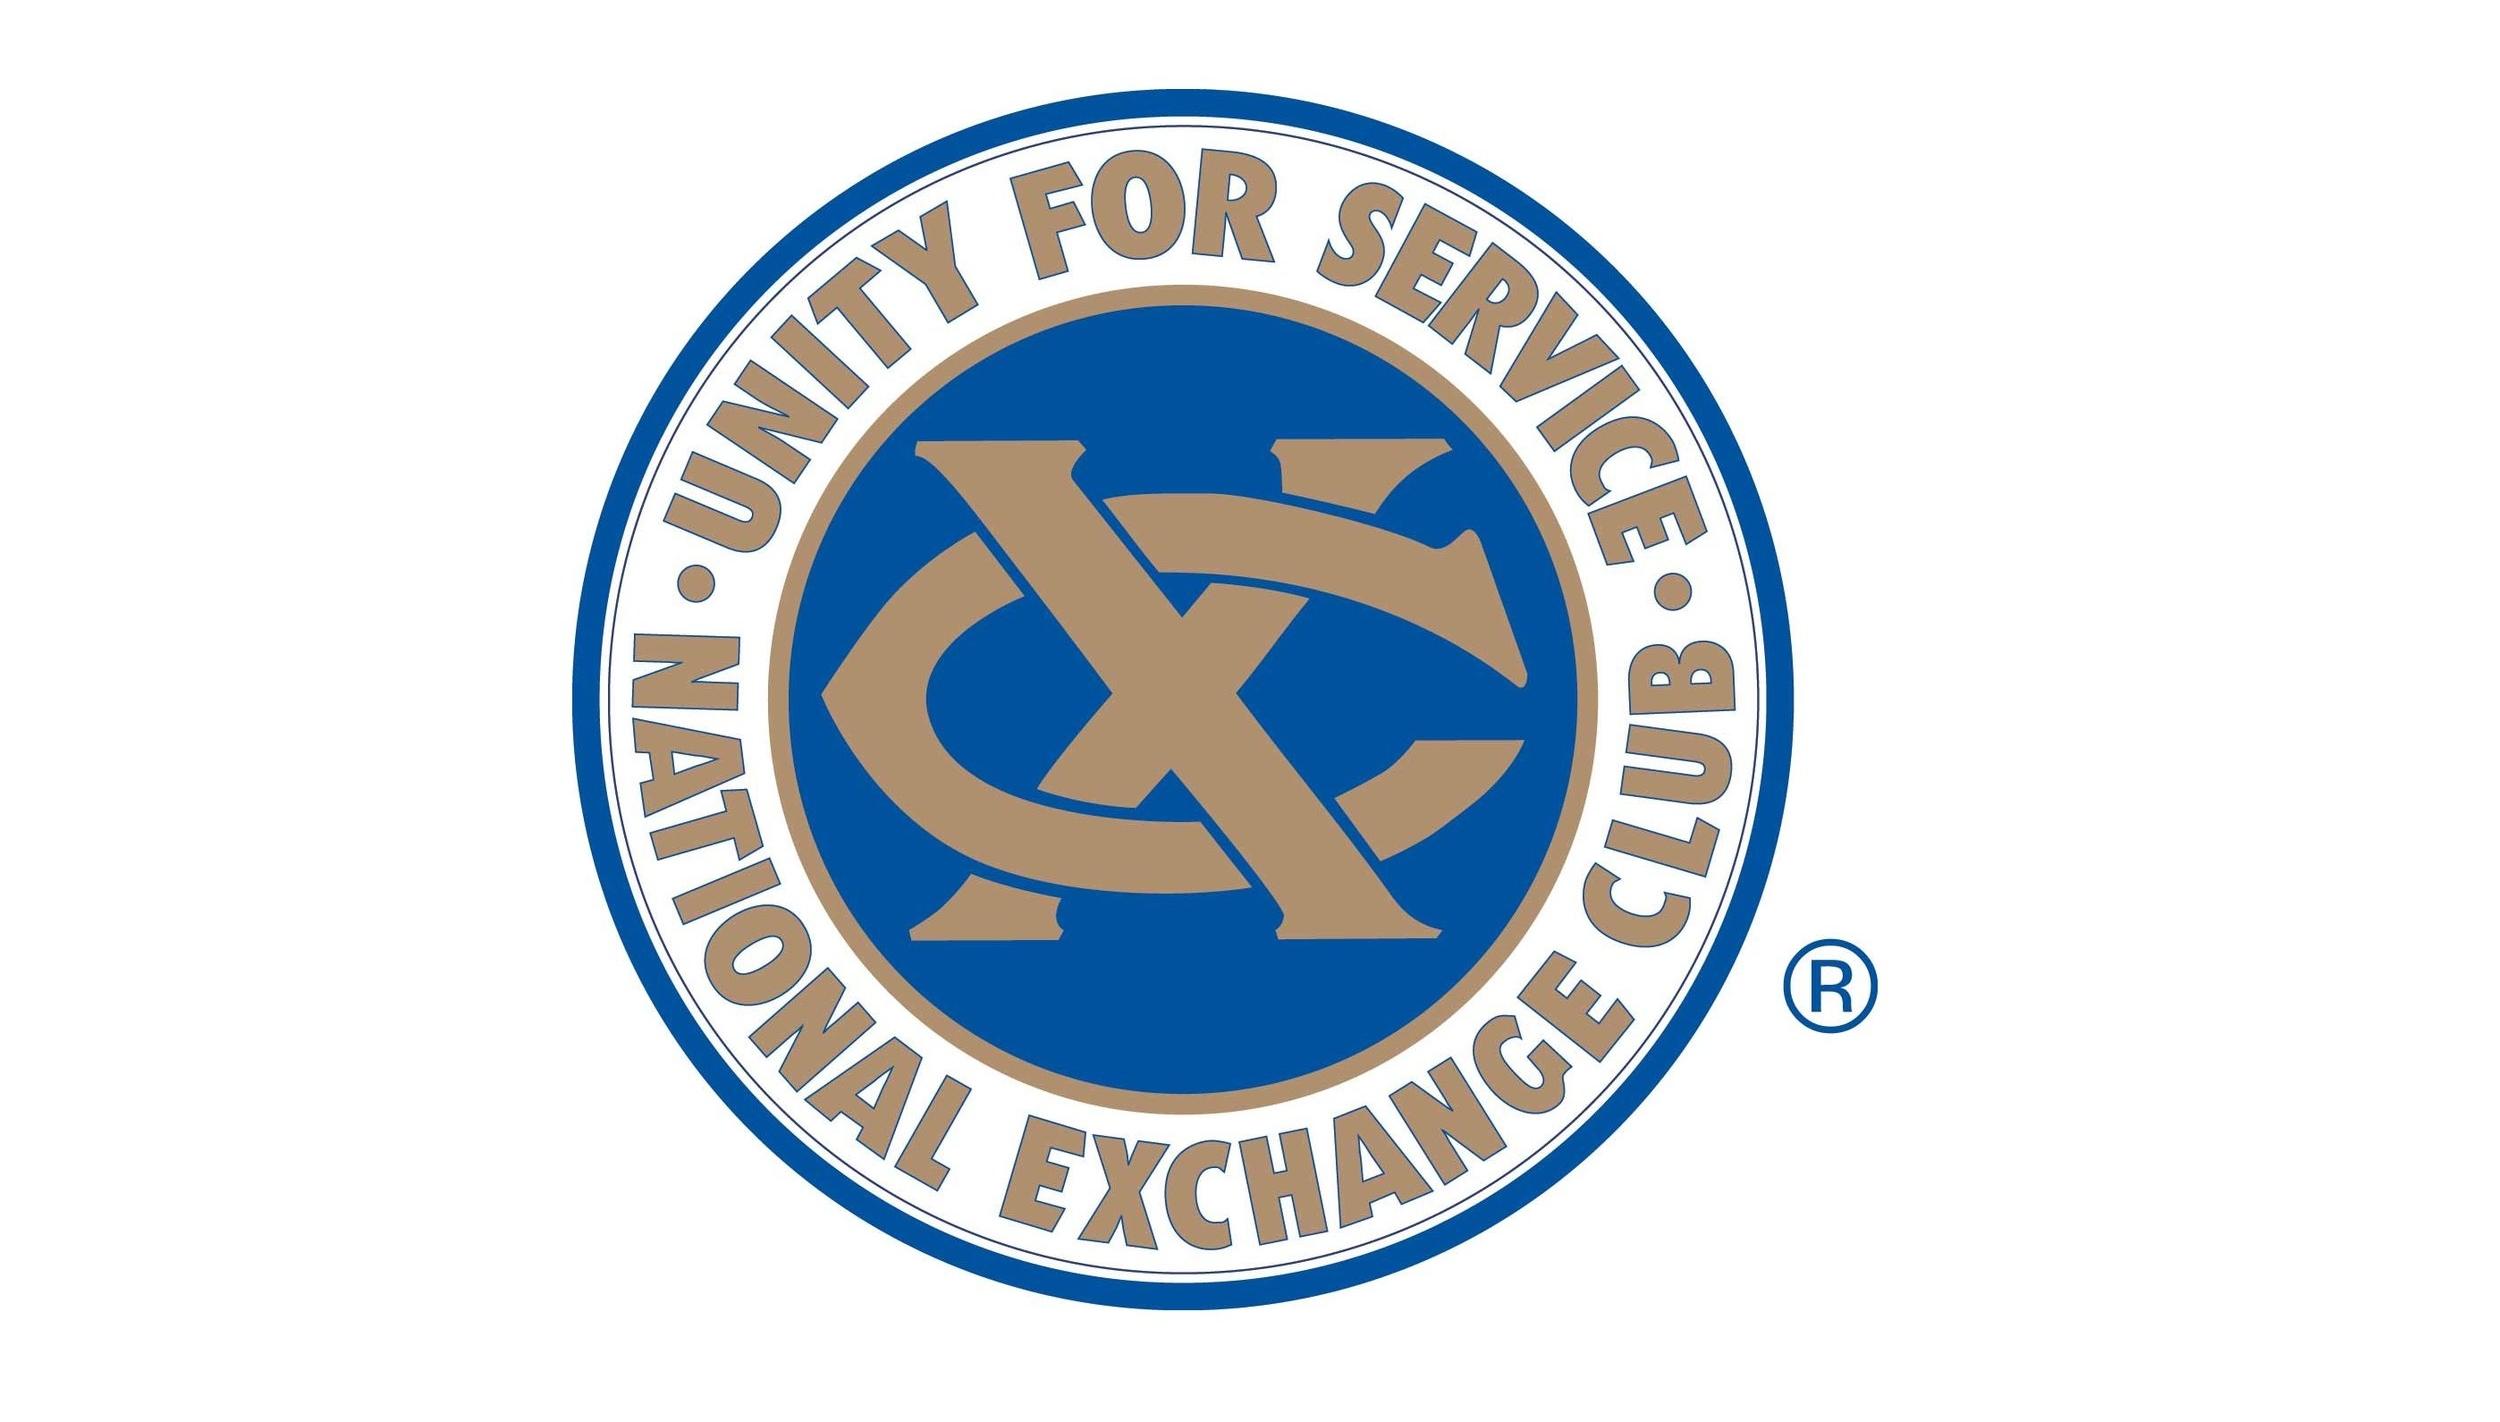 Exchange Club of Durham